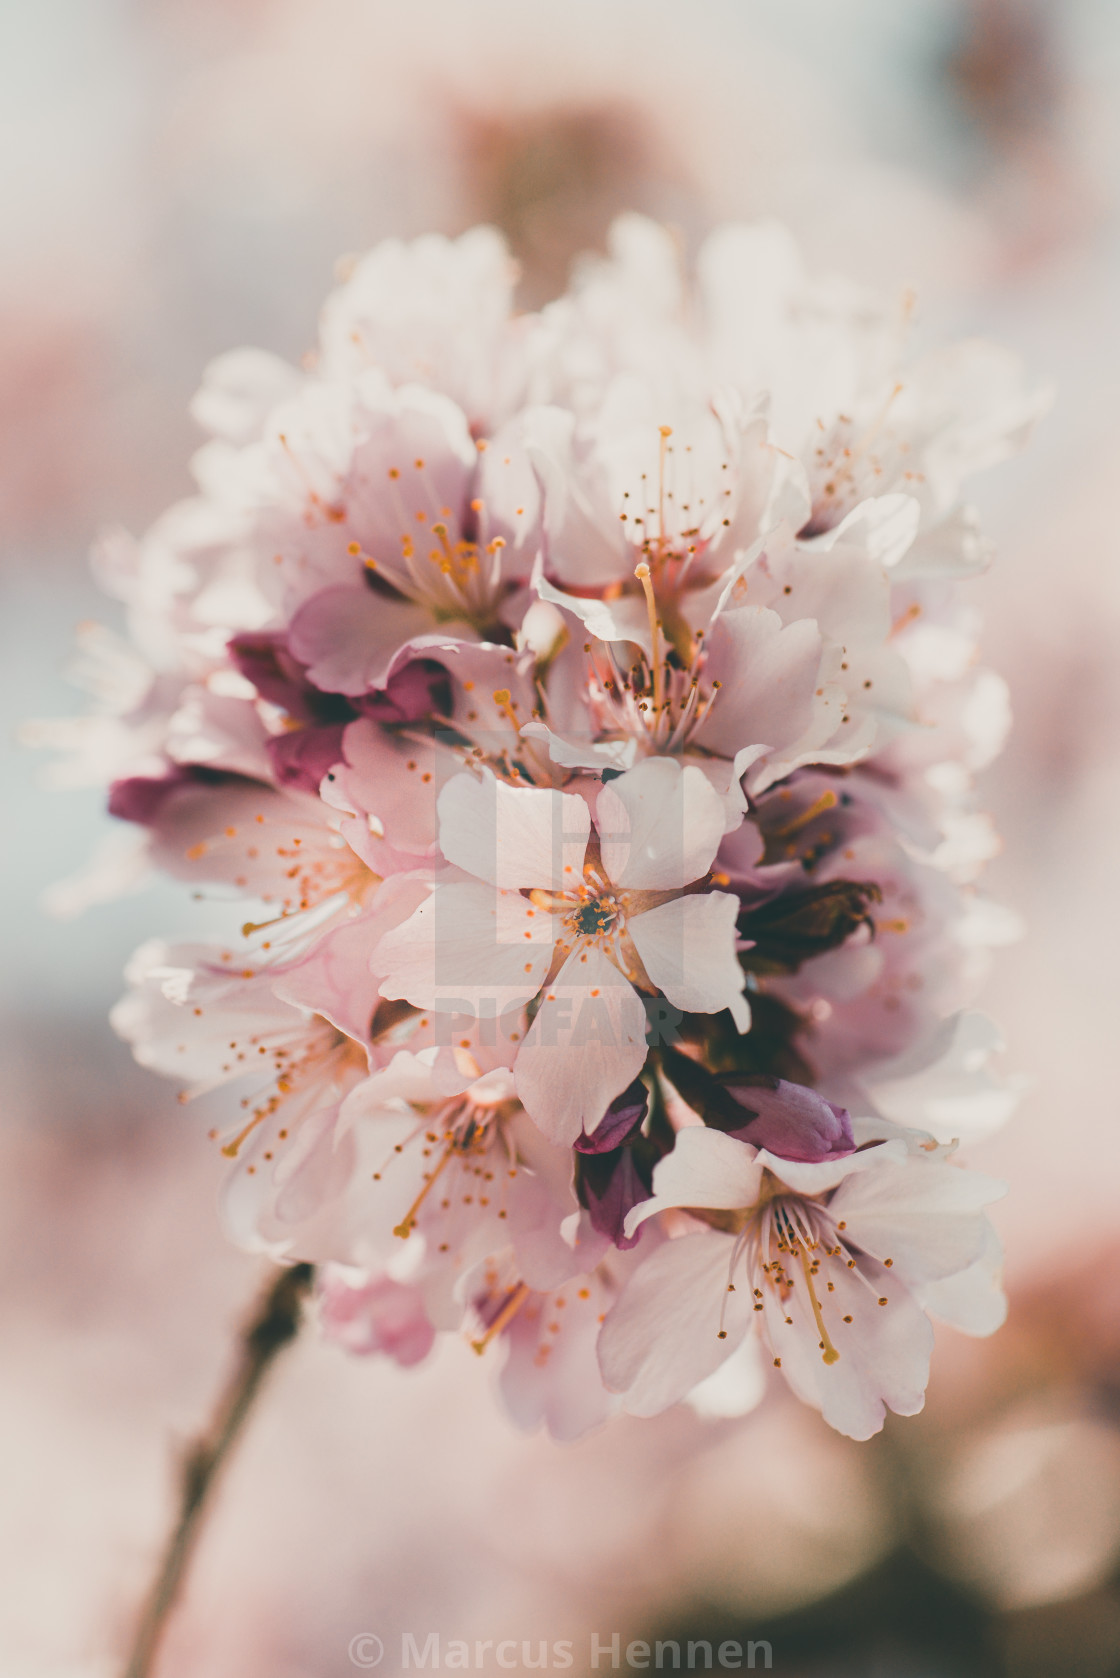 """Single Cherry blossom branch"" stock image"